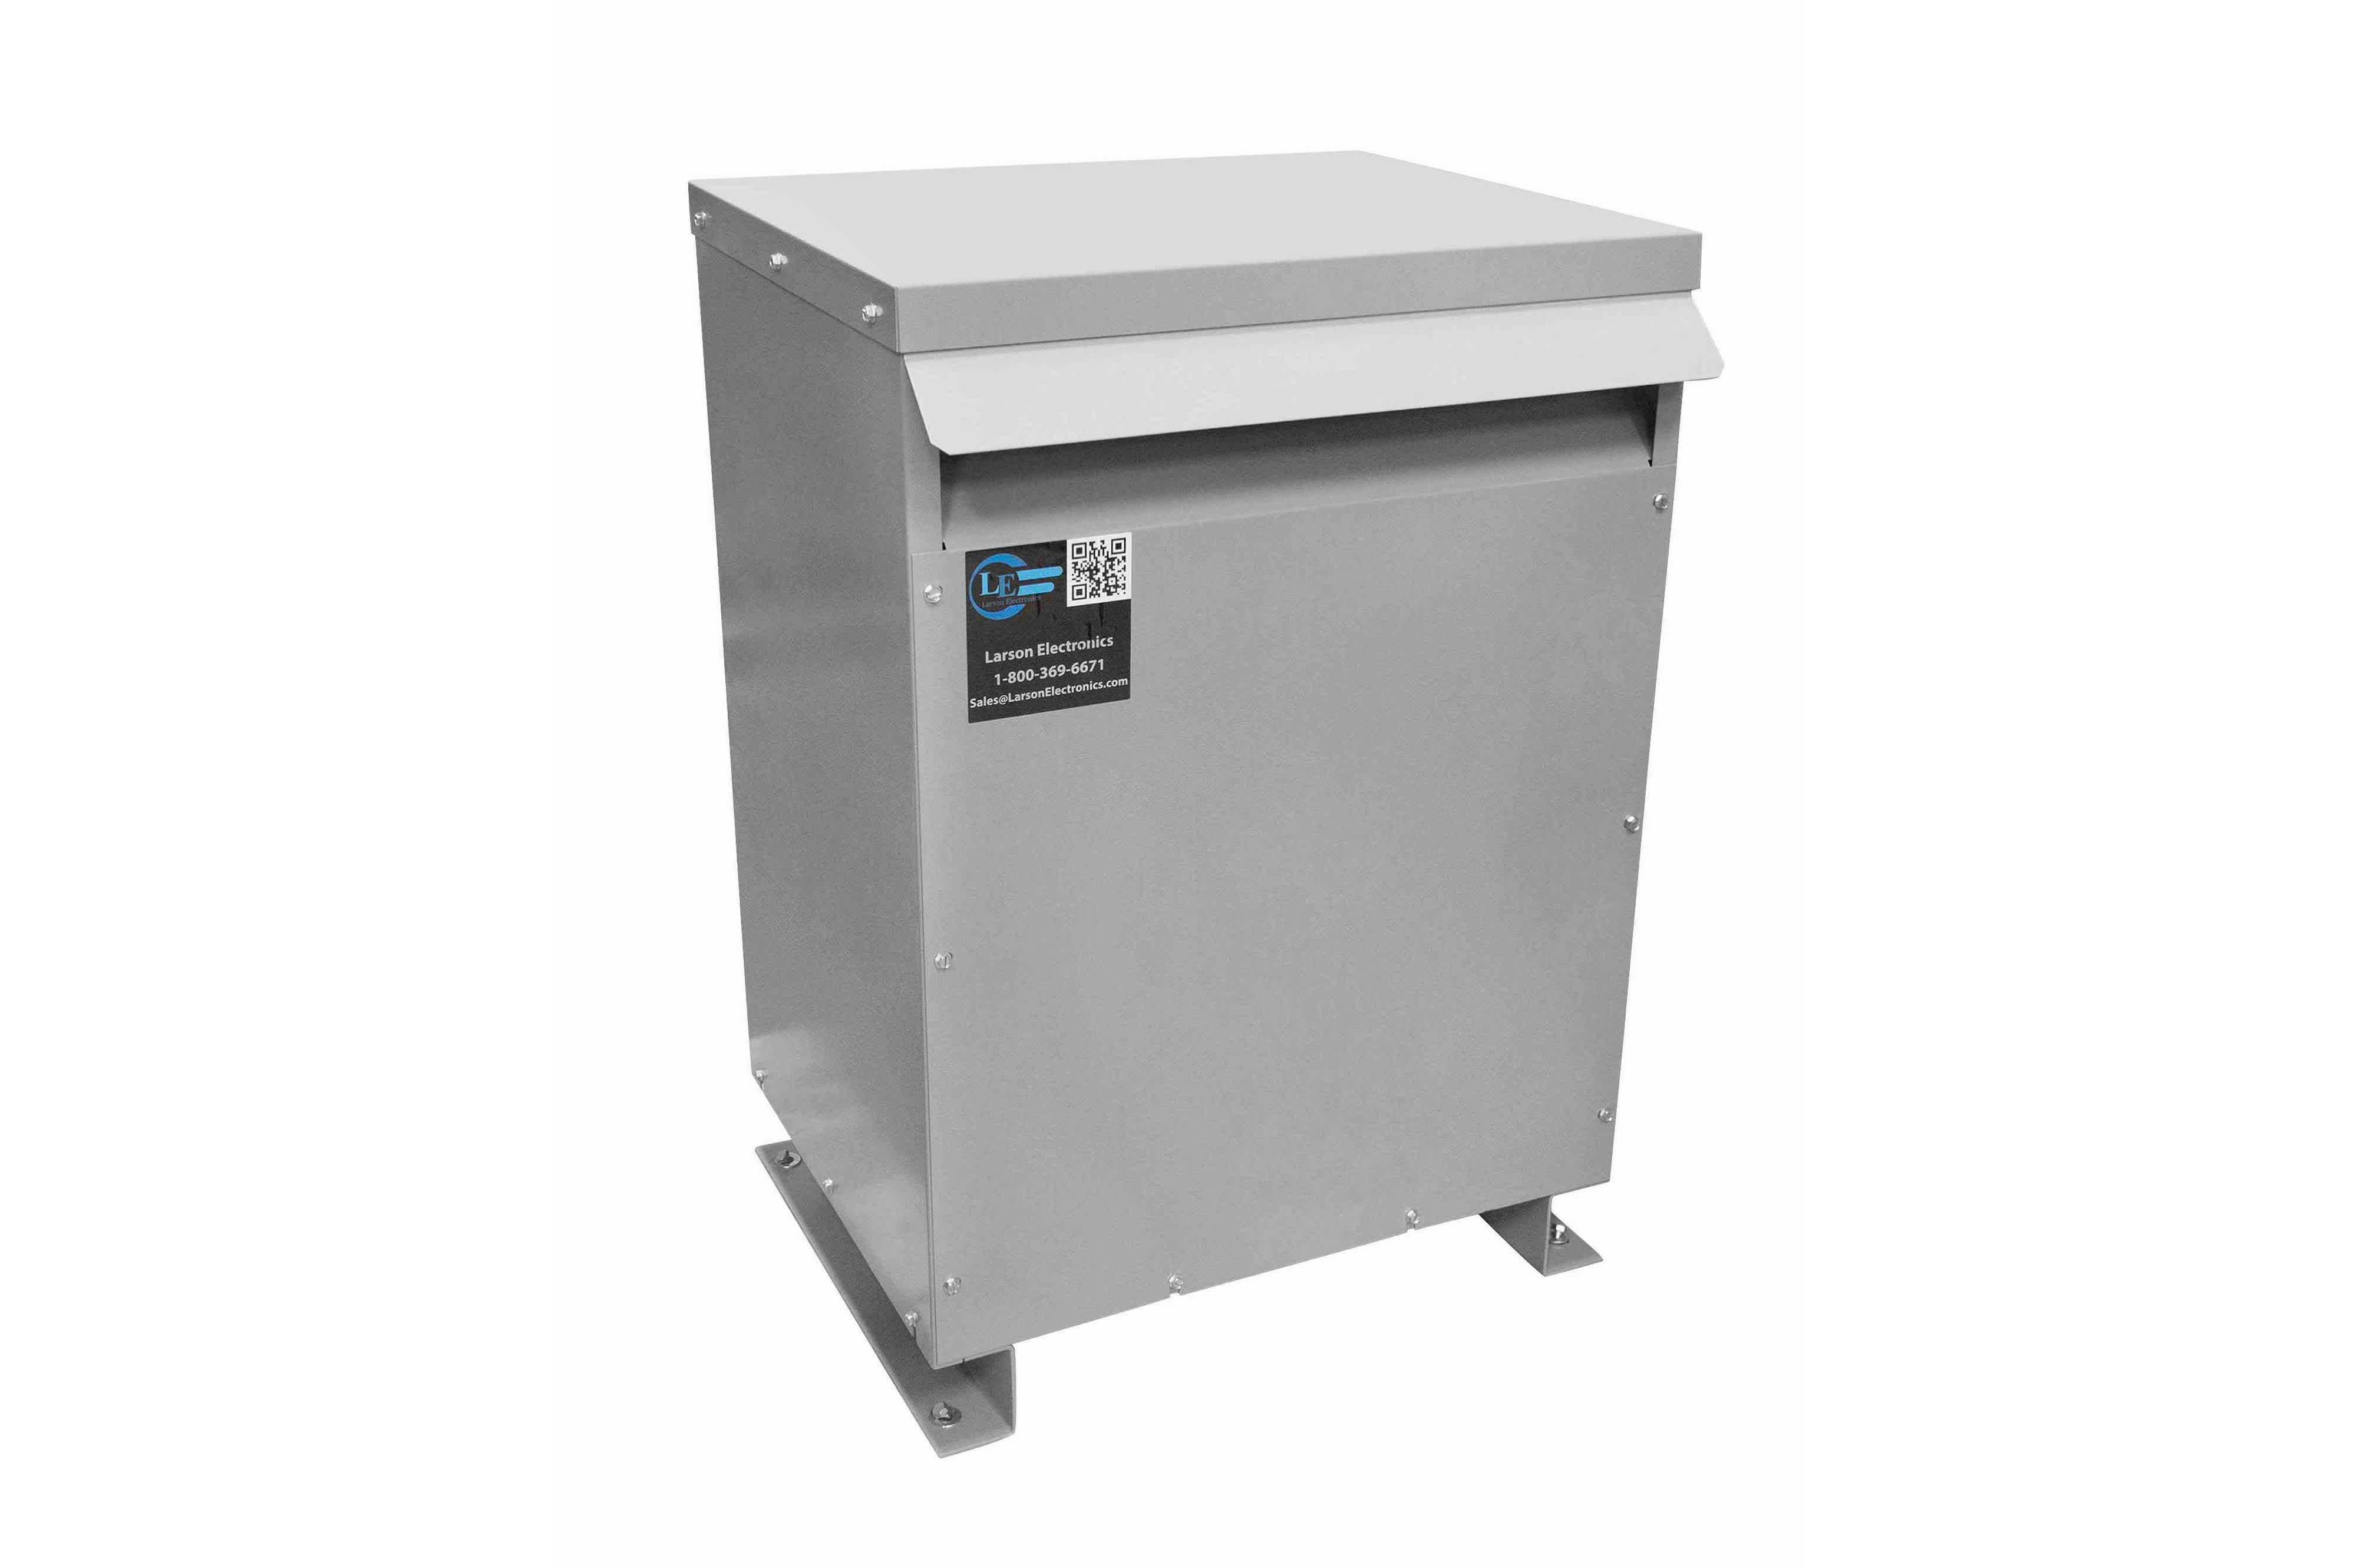 35 kVA 3PH Isolation Transformer, 600V Wye Primary, 480Y/277 Wye-N Secondary, N3R, Ventilated, 60 Hz